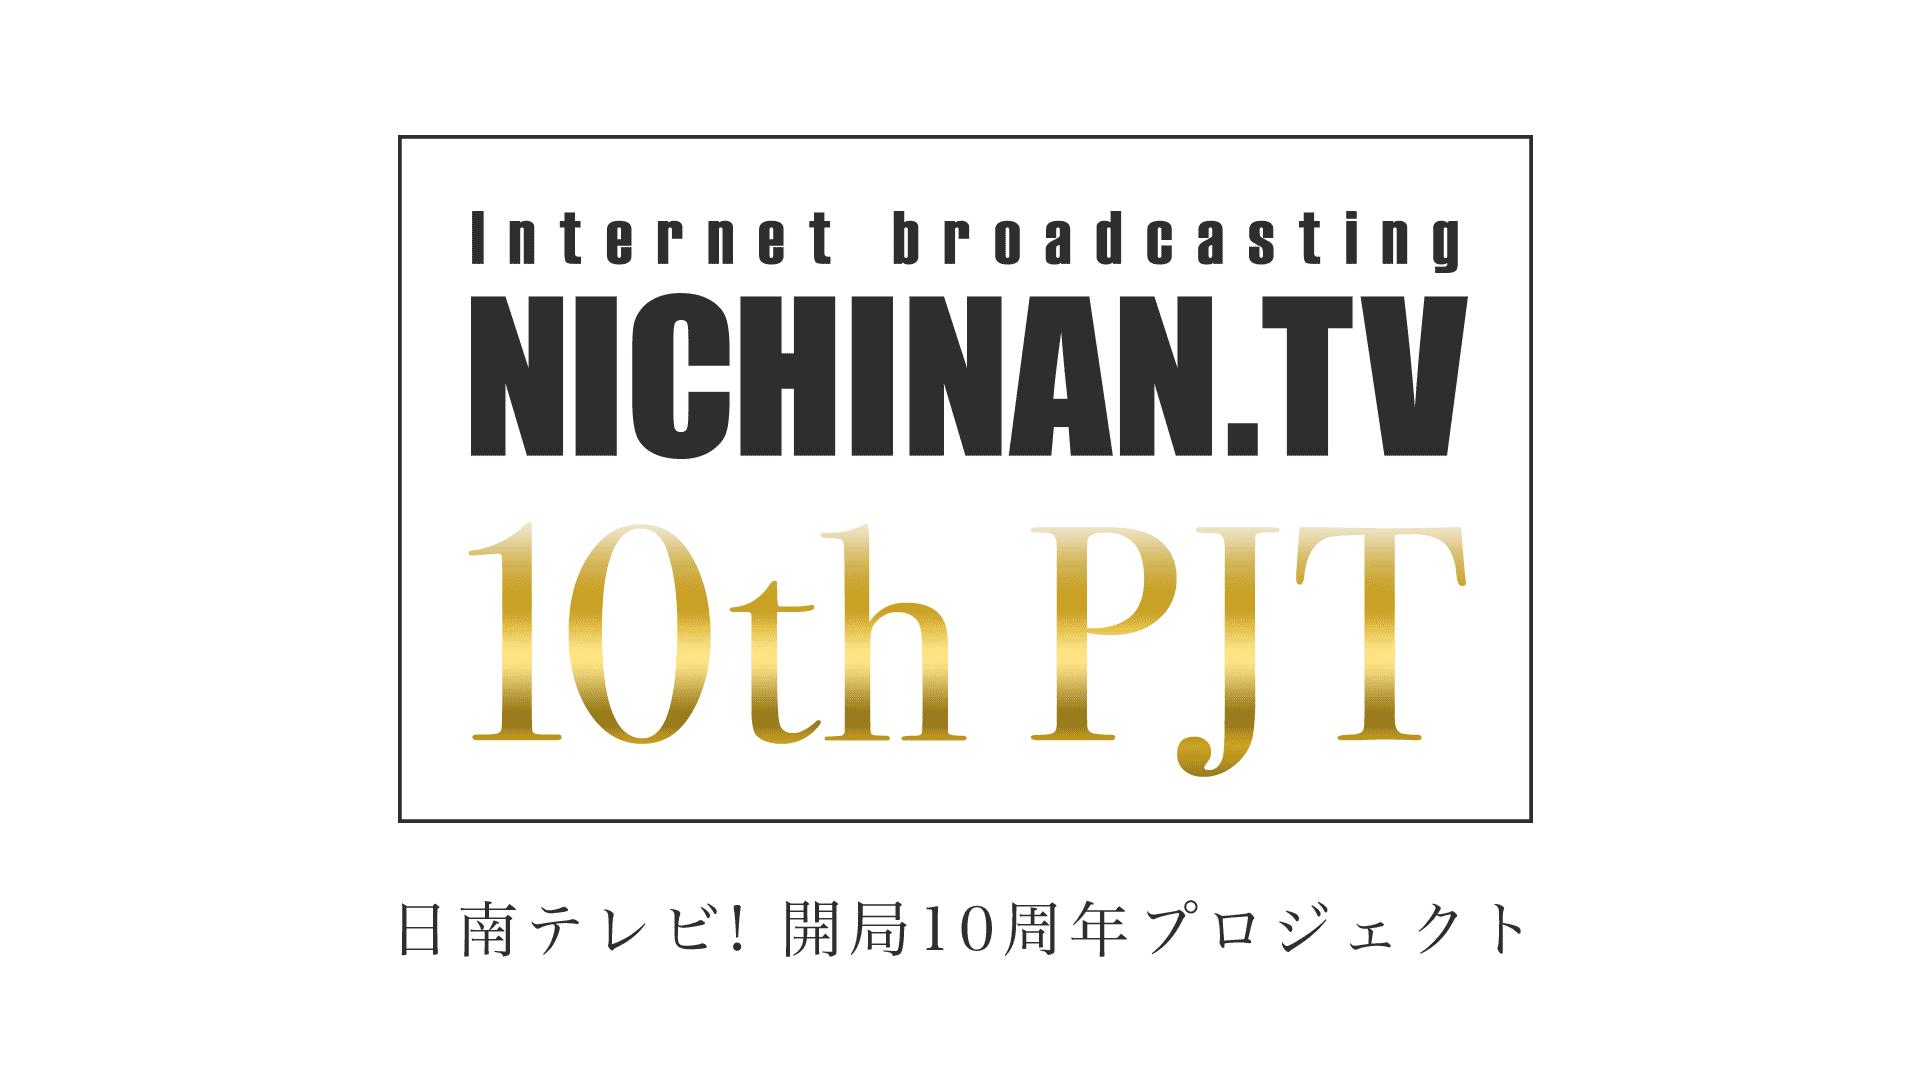 10thPJT